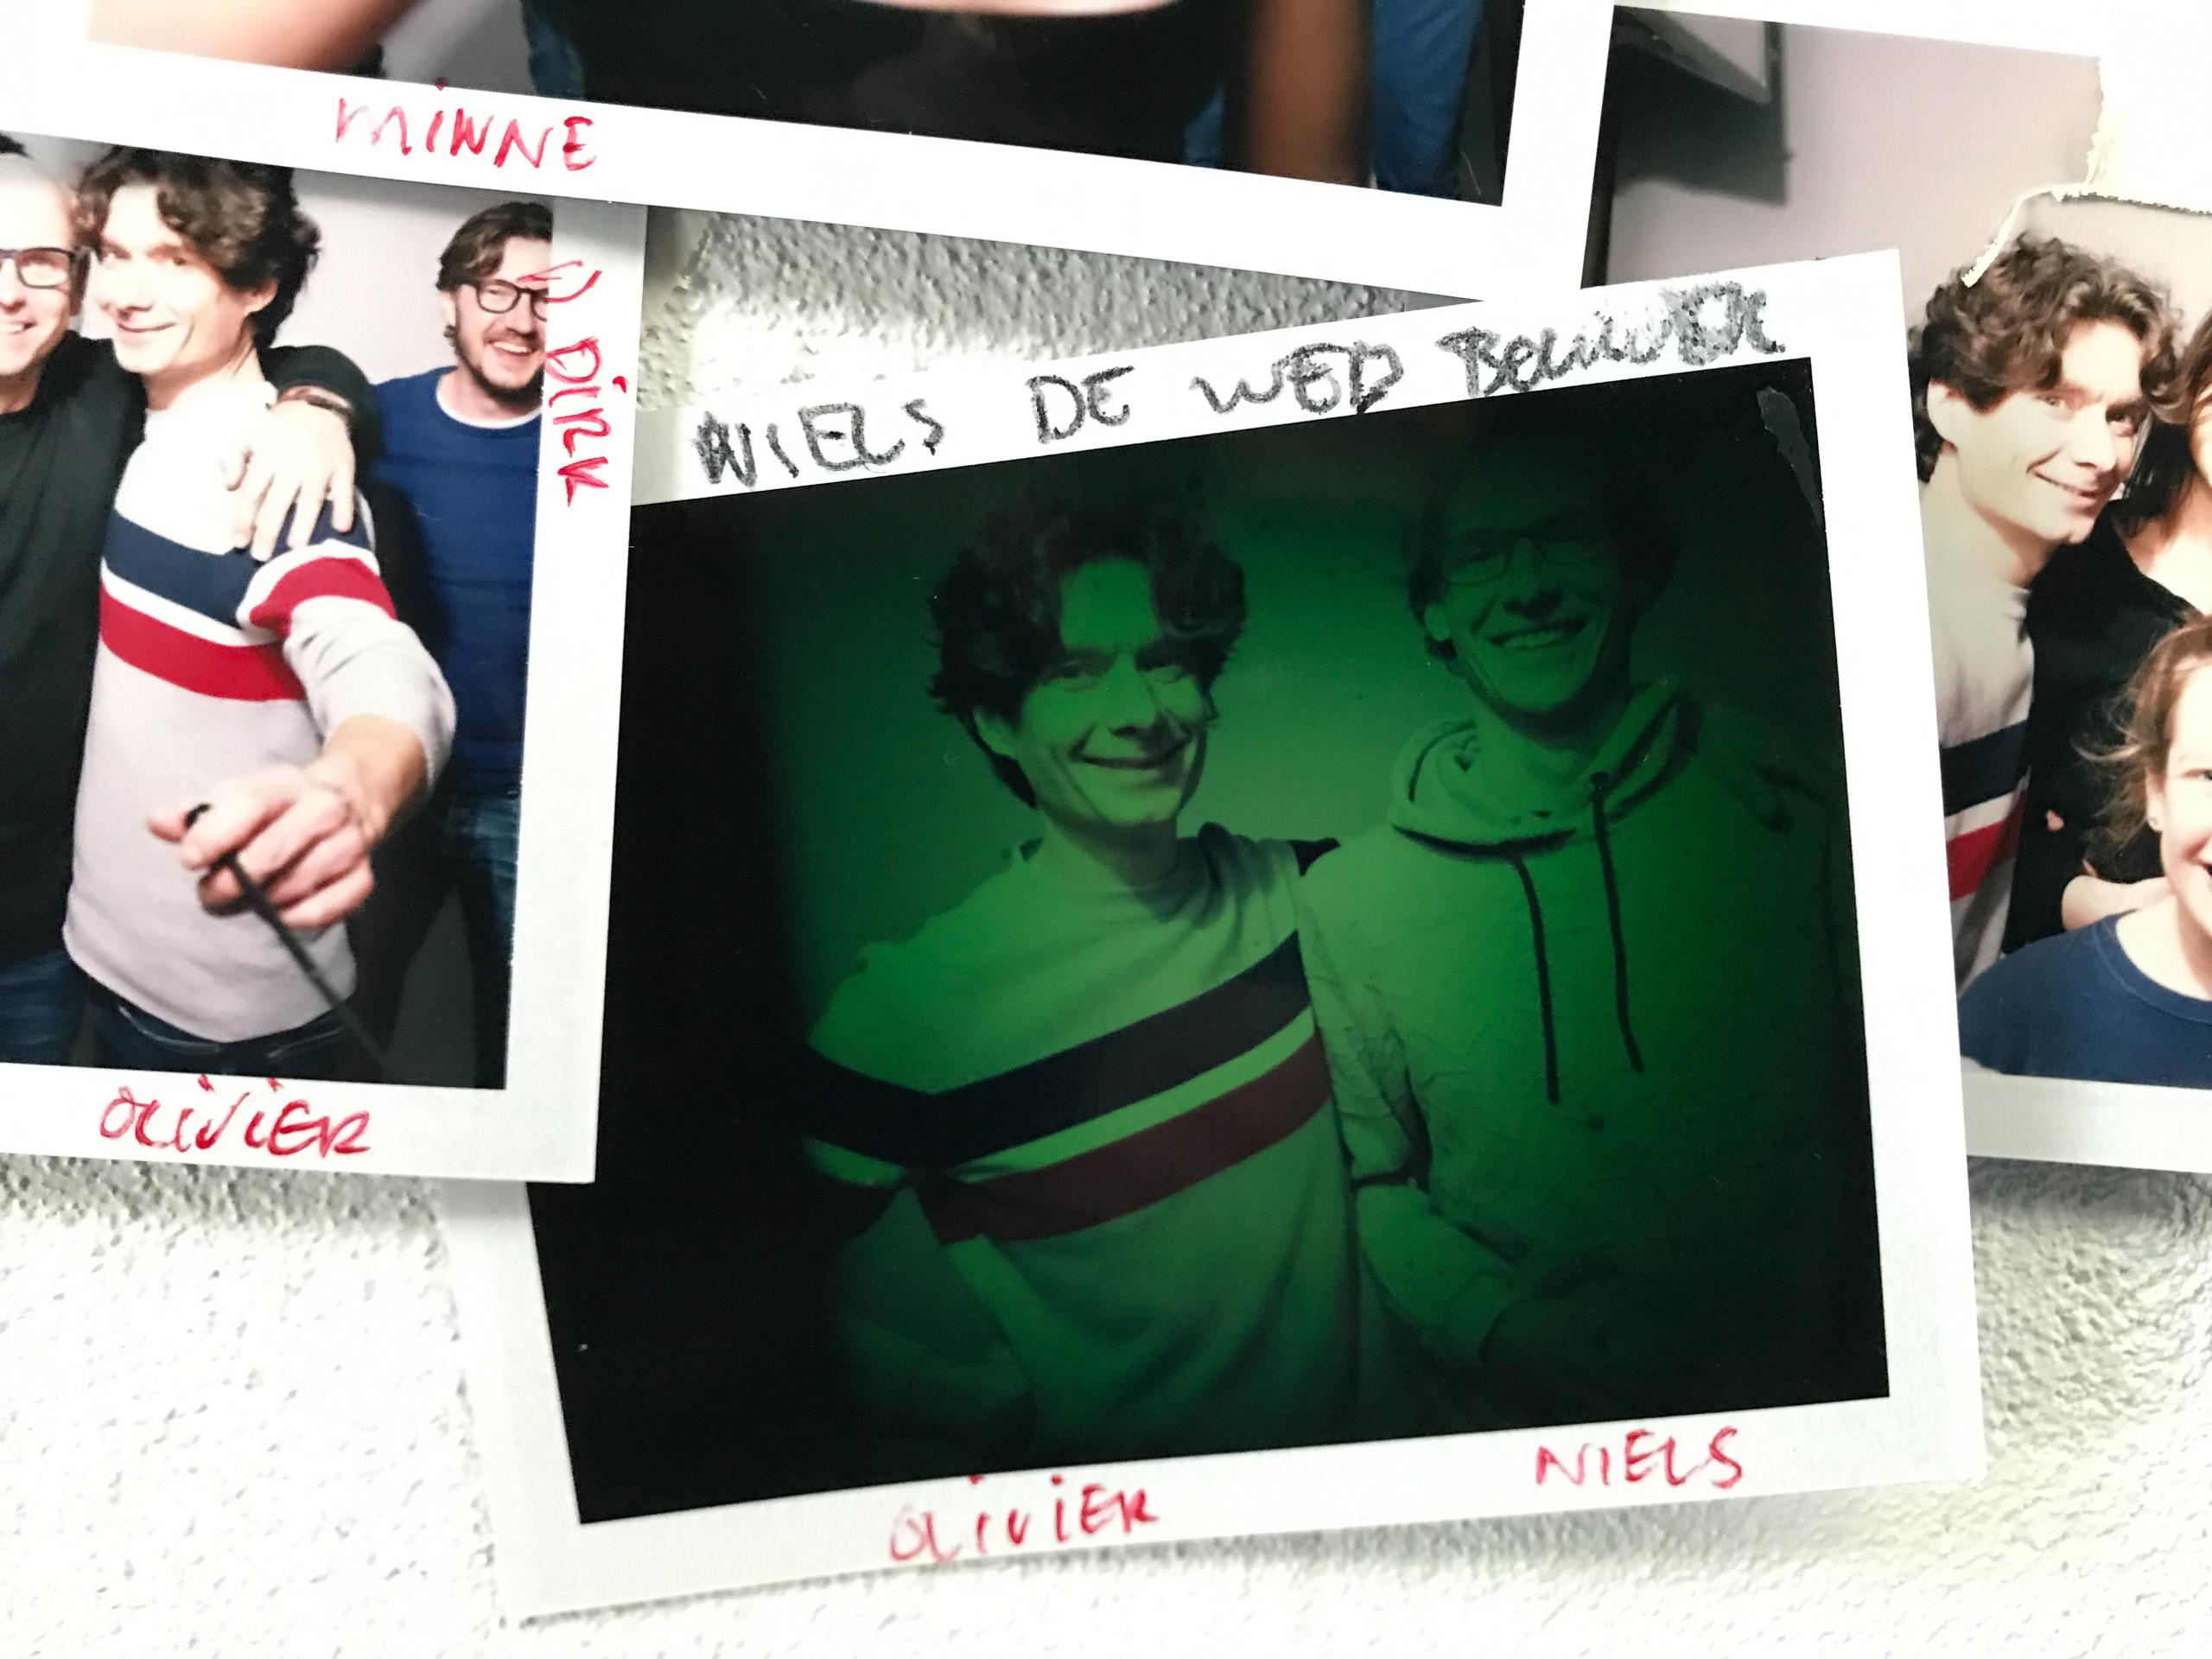 Food stylist fotograaf met Olivier en Niels gemaakt door Studio_m Fotograaf Amsterdam